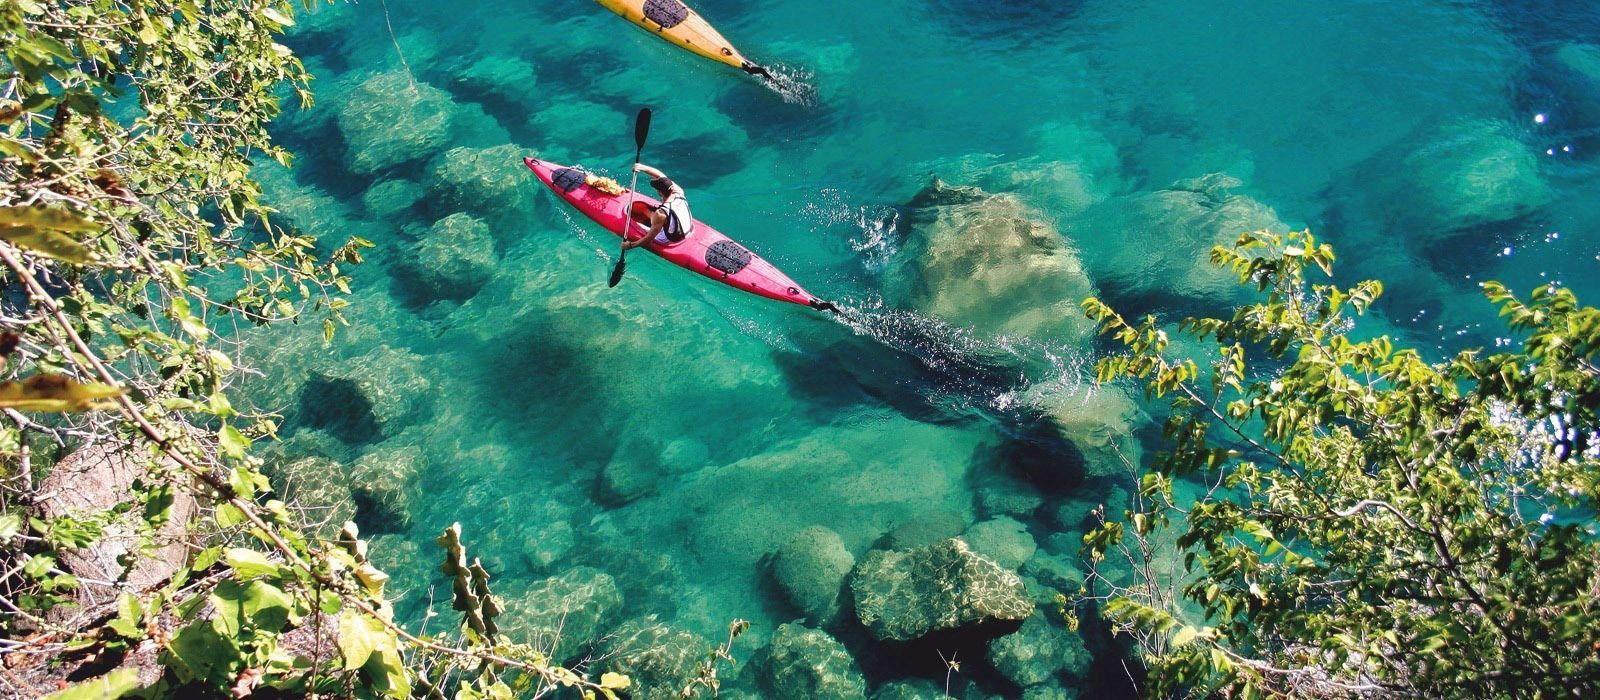 Malawi Rundreise: Natur, Safari und Lake Malawi Urlaub 3